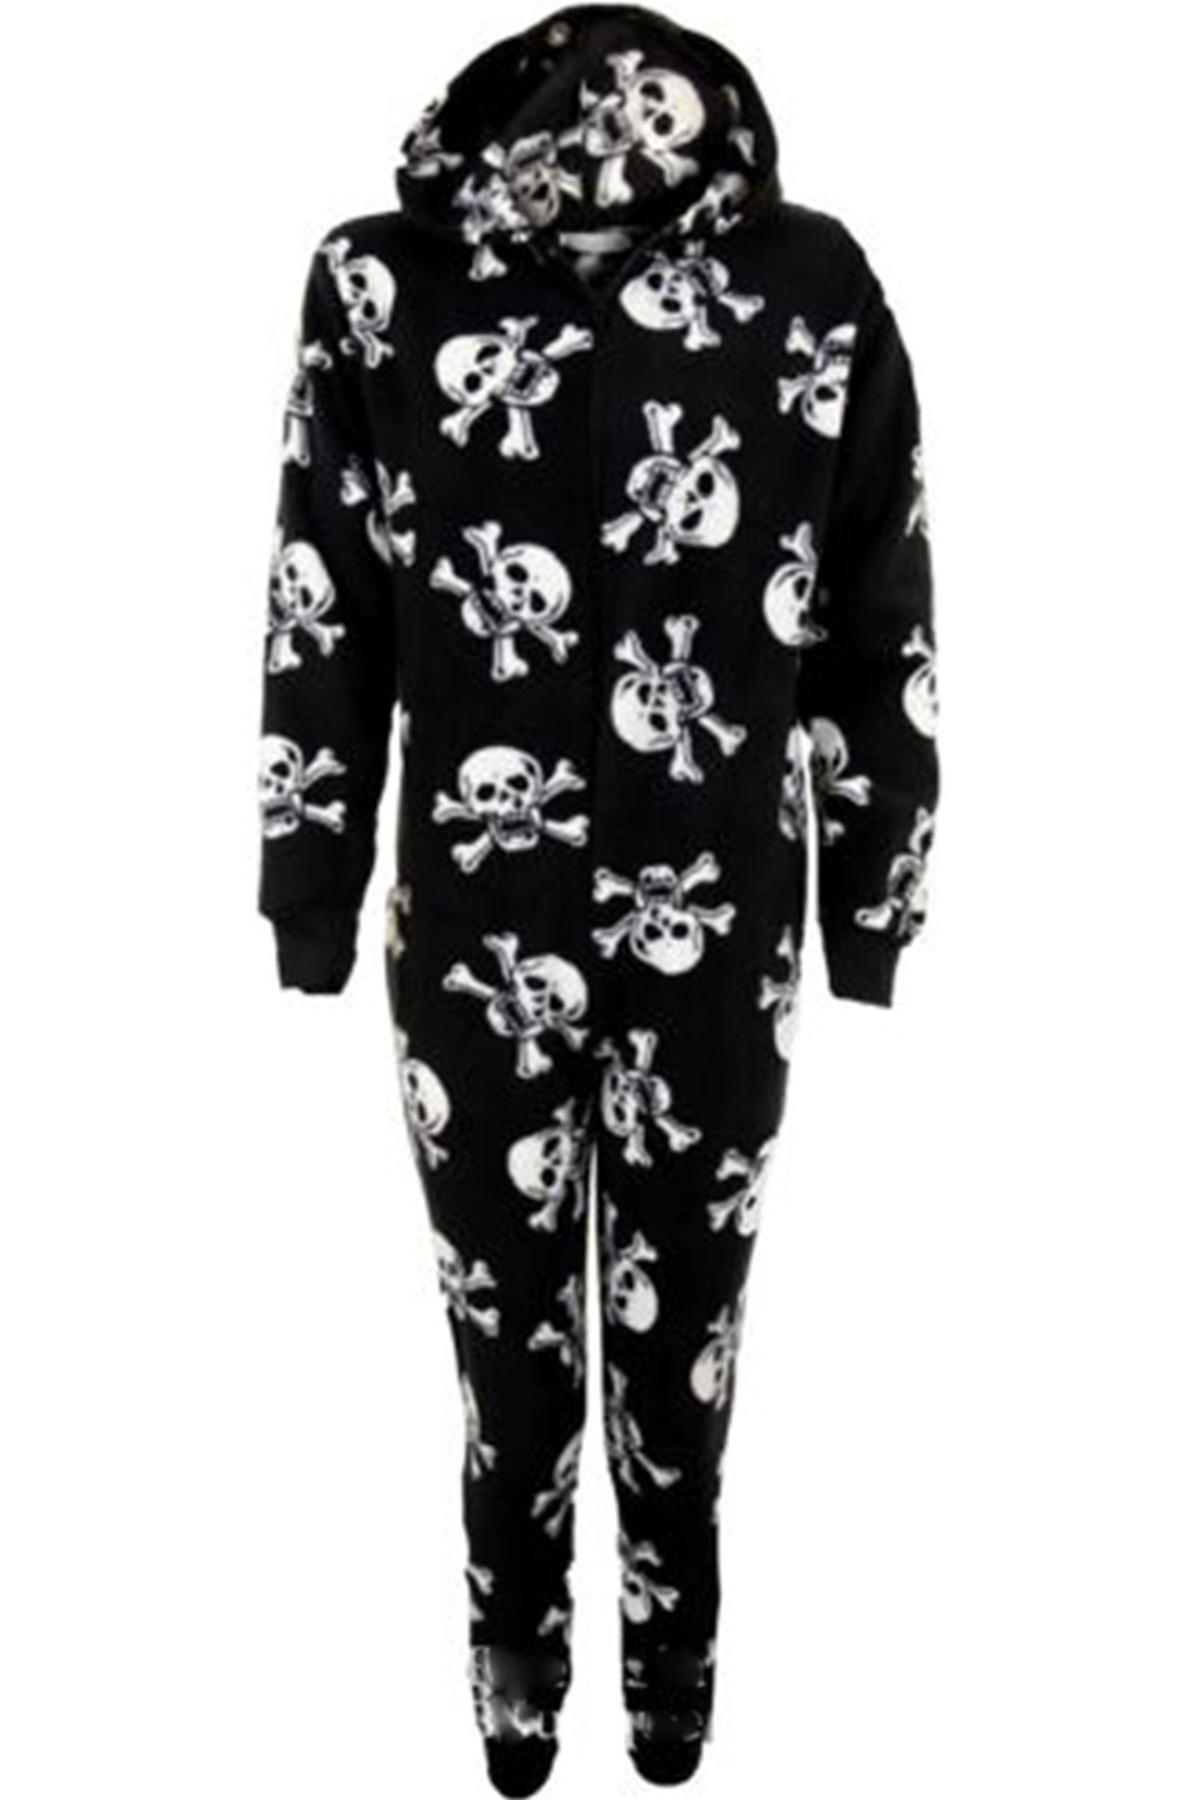 Children's Hooded Tiger Zebra Skull Warm Zip Up Kid's All In One Onsie Pyjamas